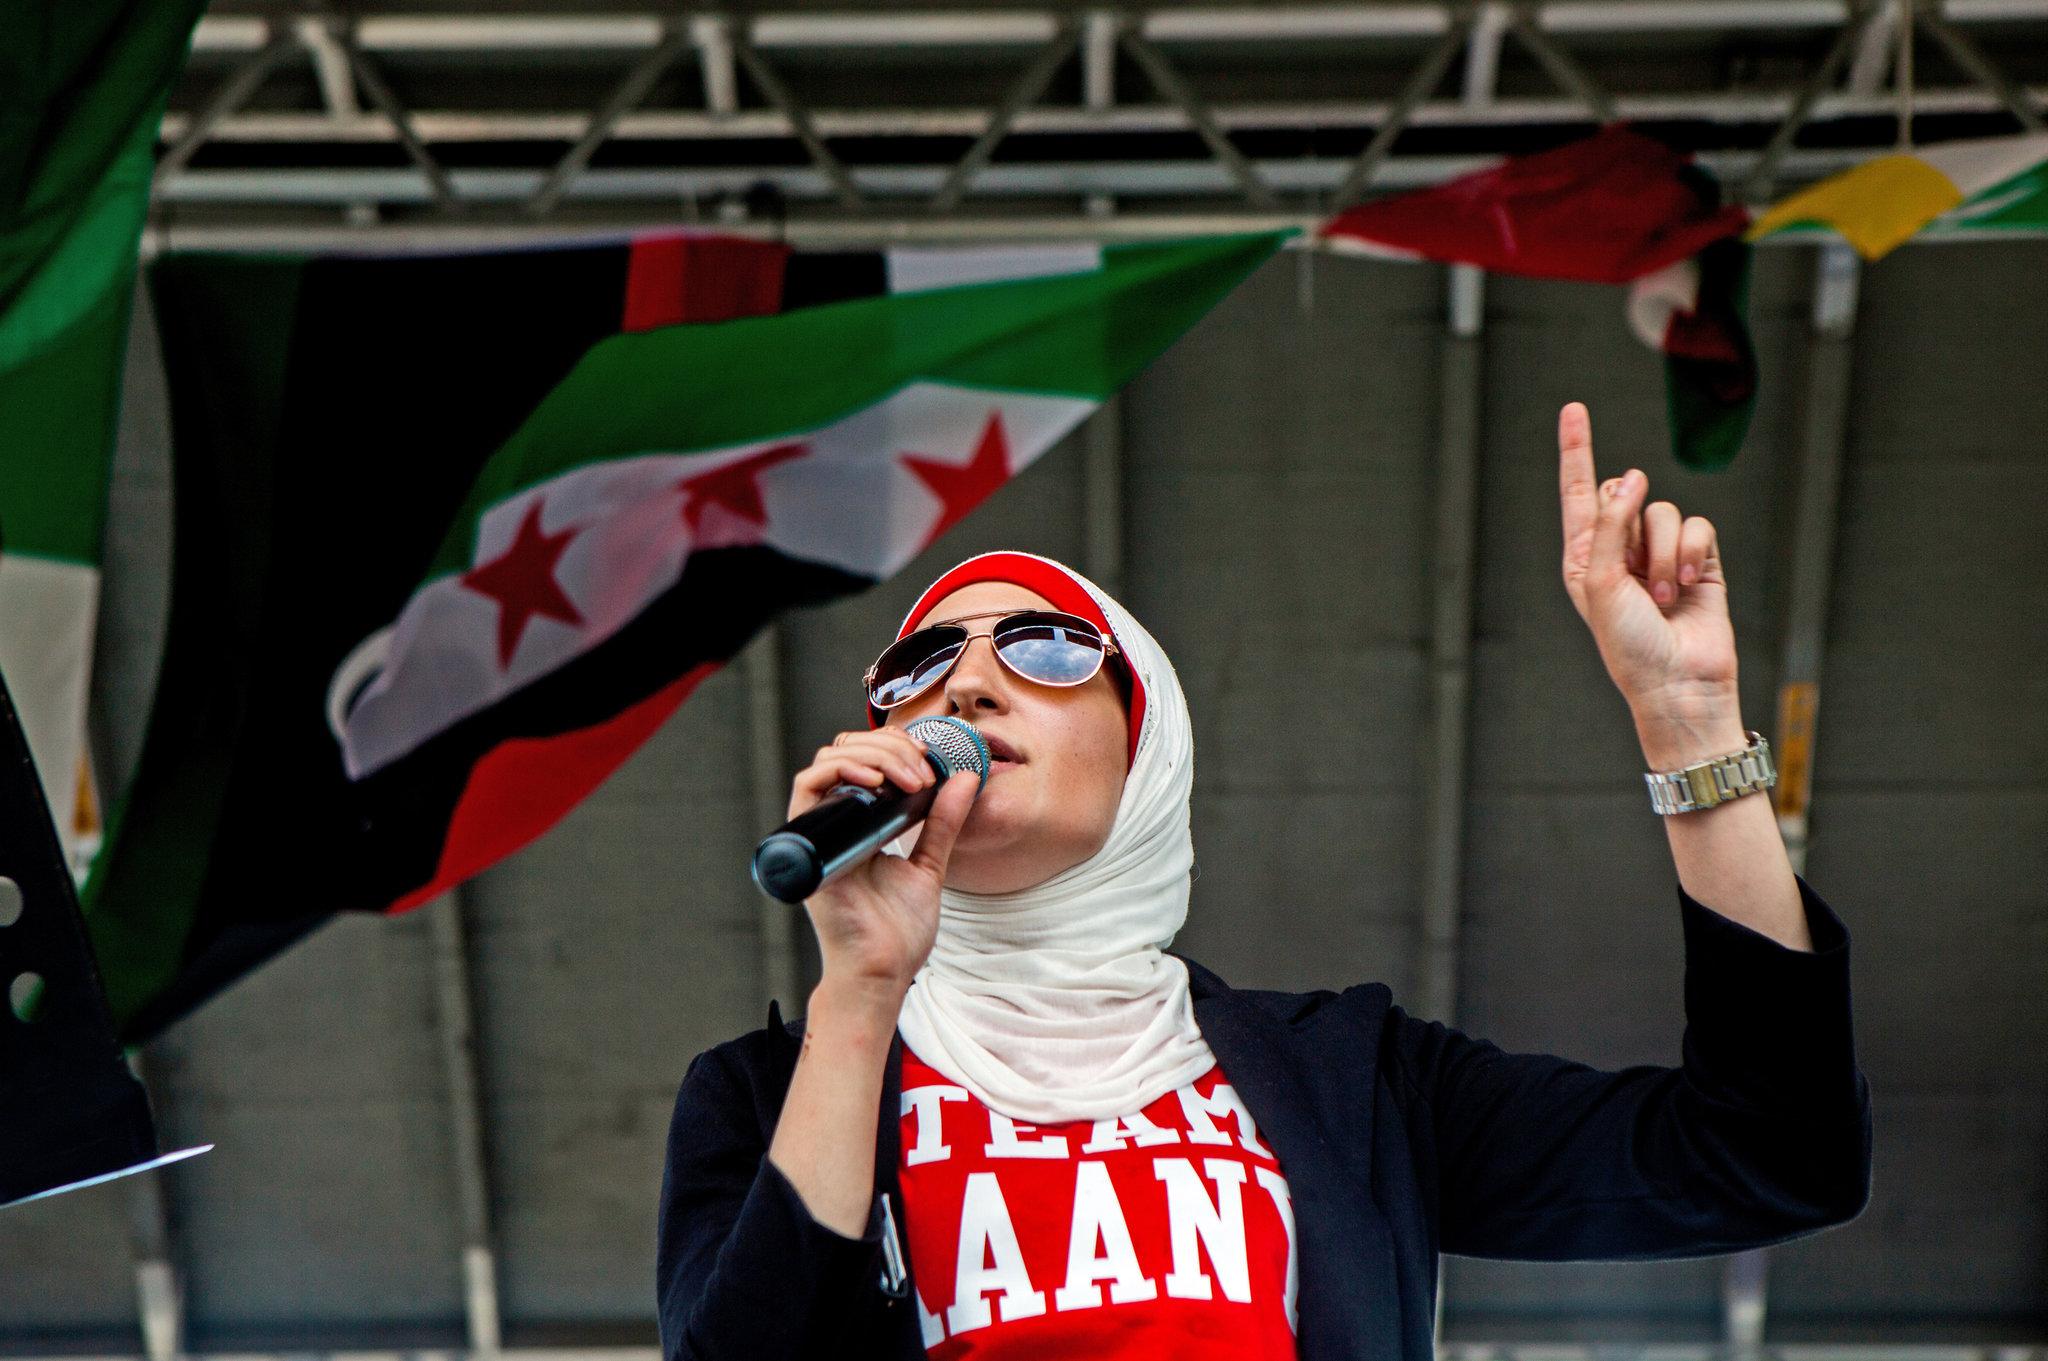 Così mi dice chiara, rossetto rosso, hijab giallo e. Linda Sarsour Is A Brooklyn Homegirl In A Hijab The New York Times